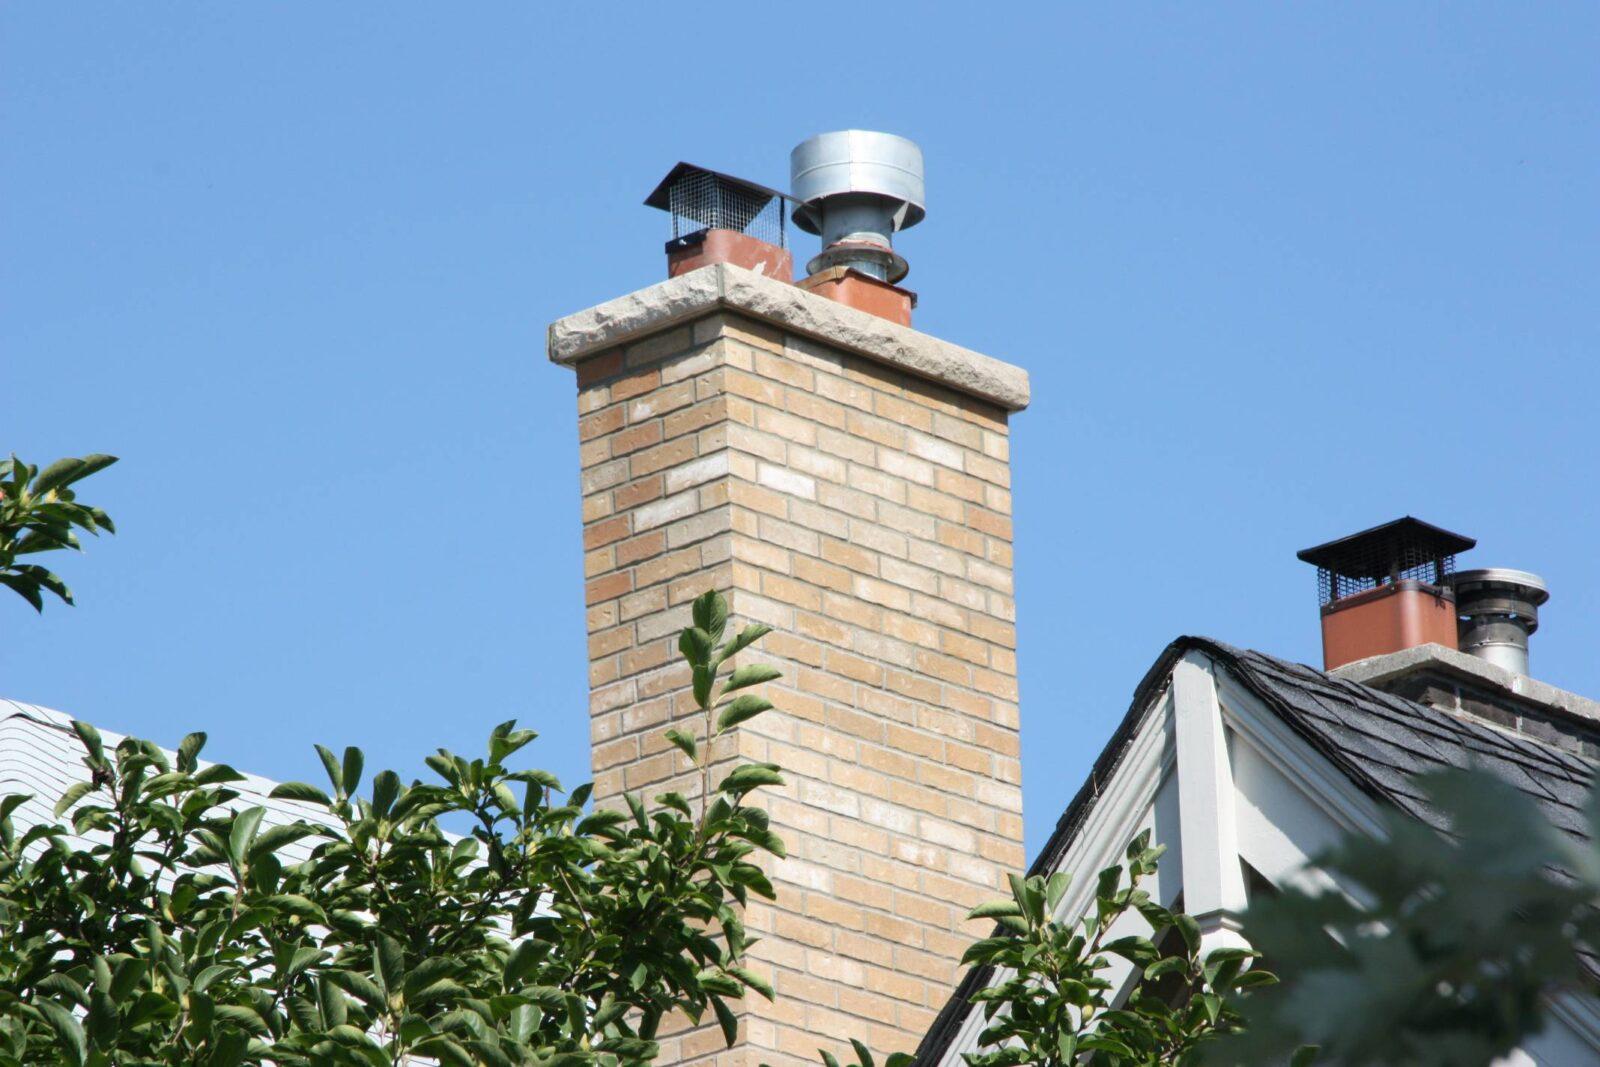 chimney cleaning toronto